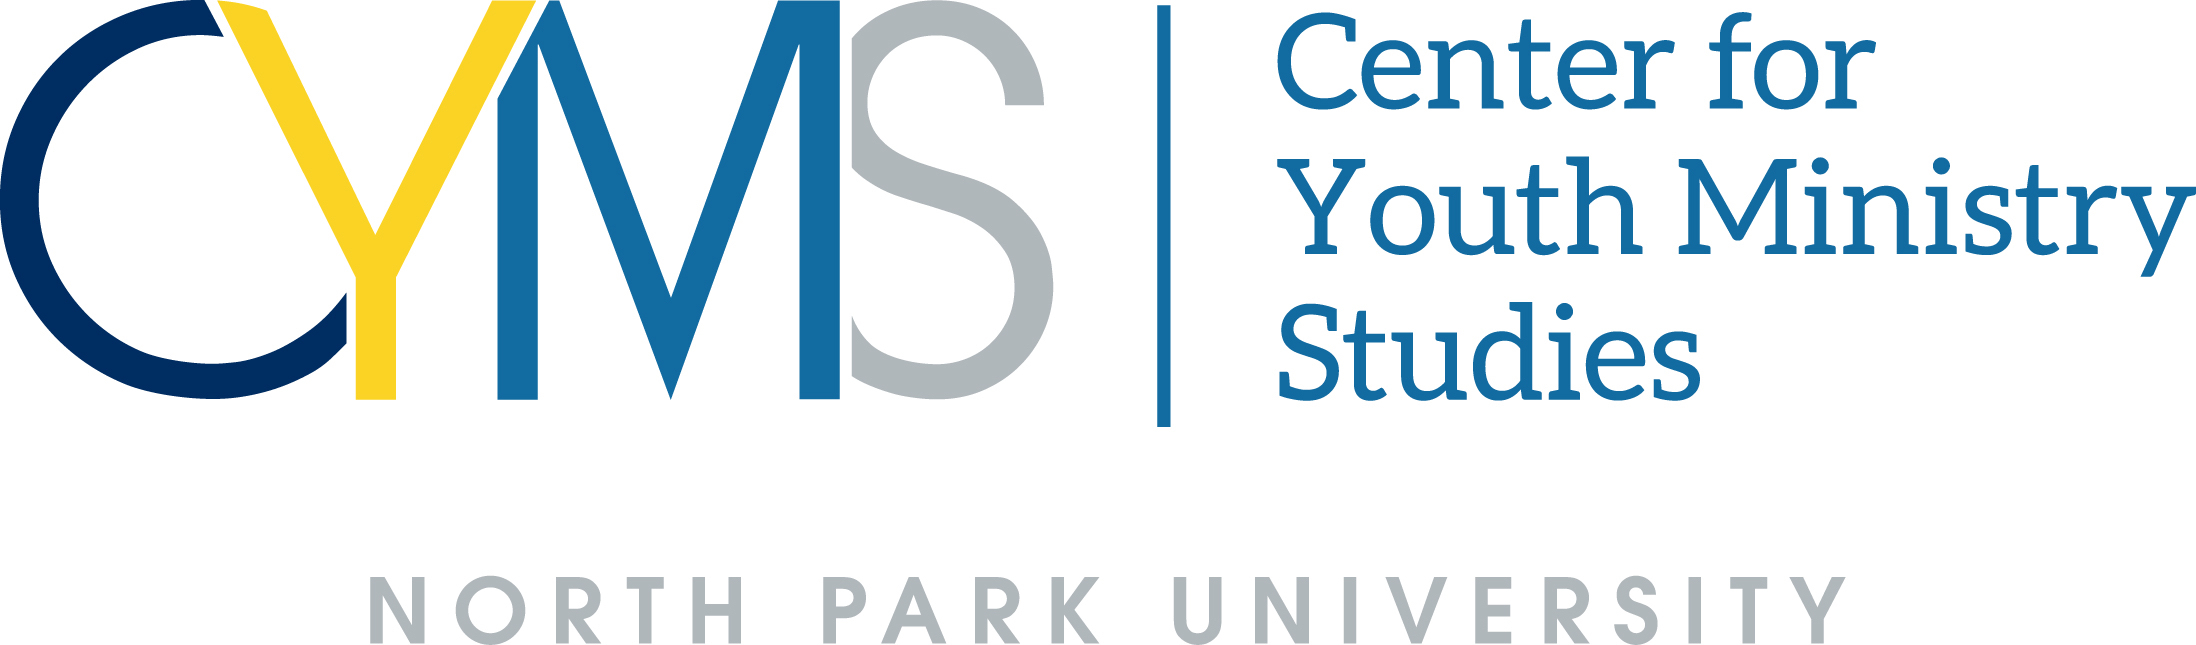 CYMS Logo Dark.jpg